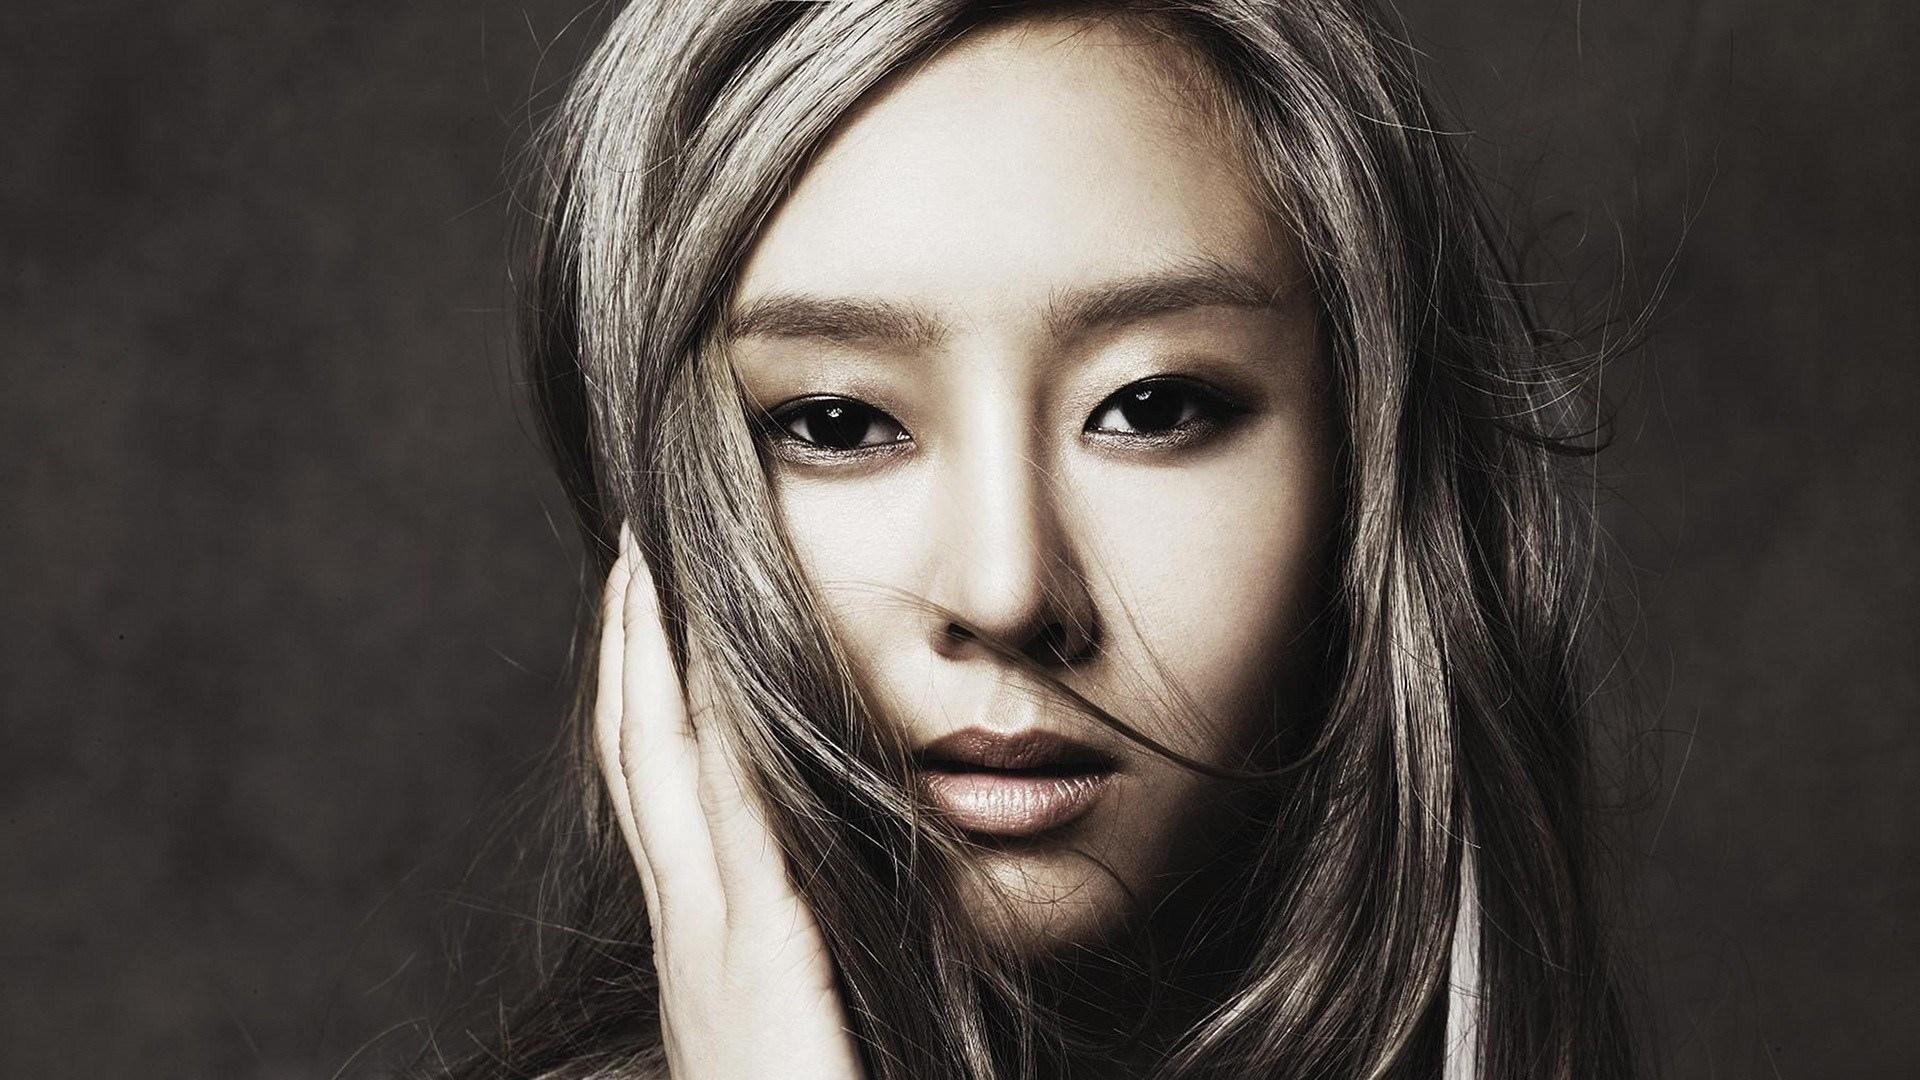 Korean Women wallpapers HD quality